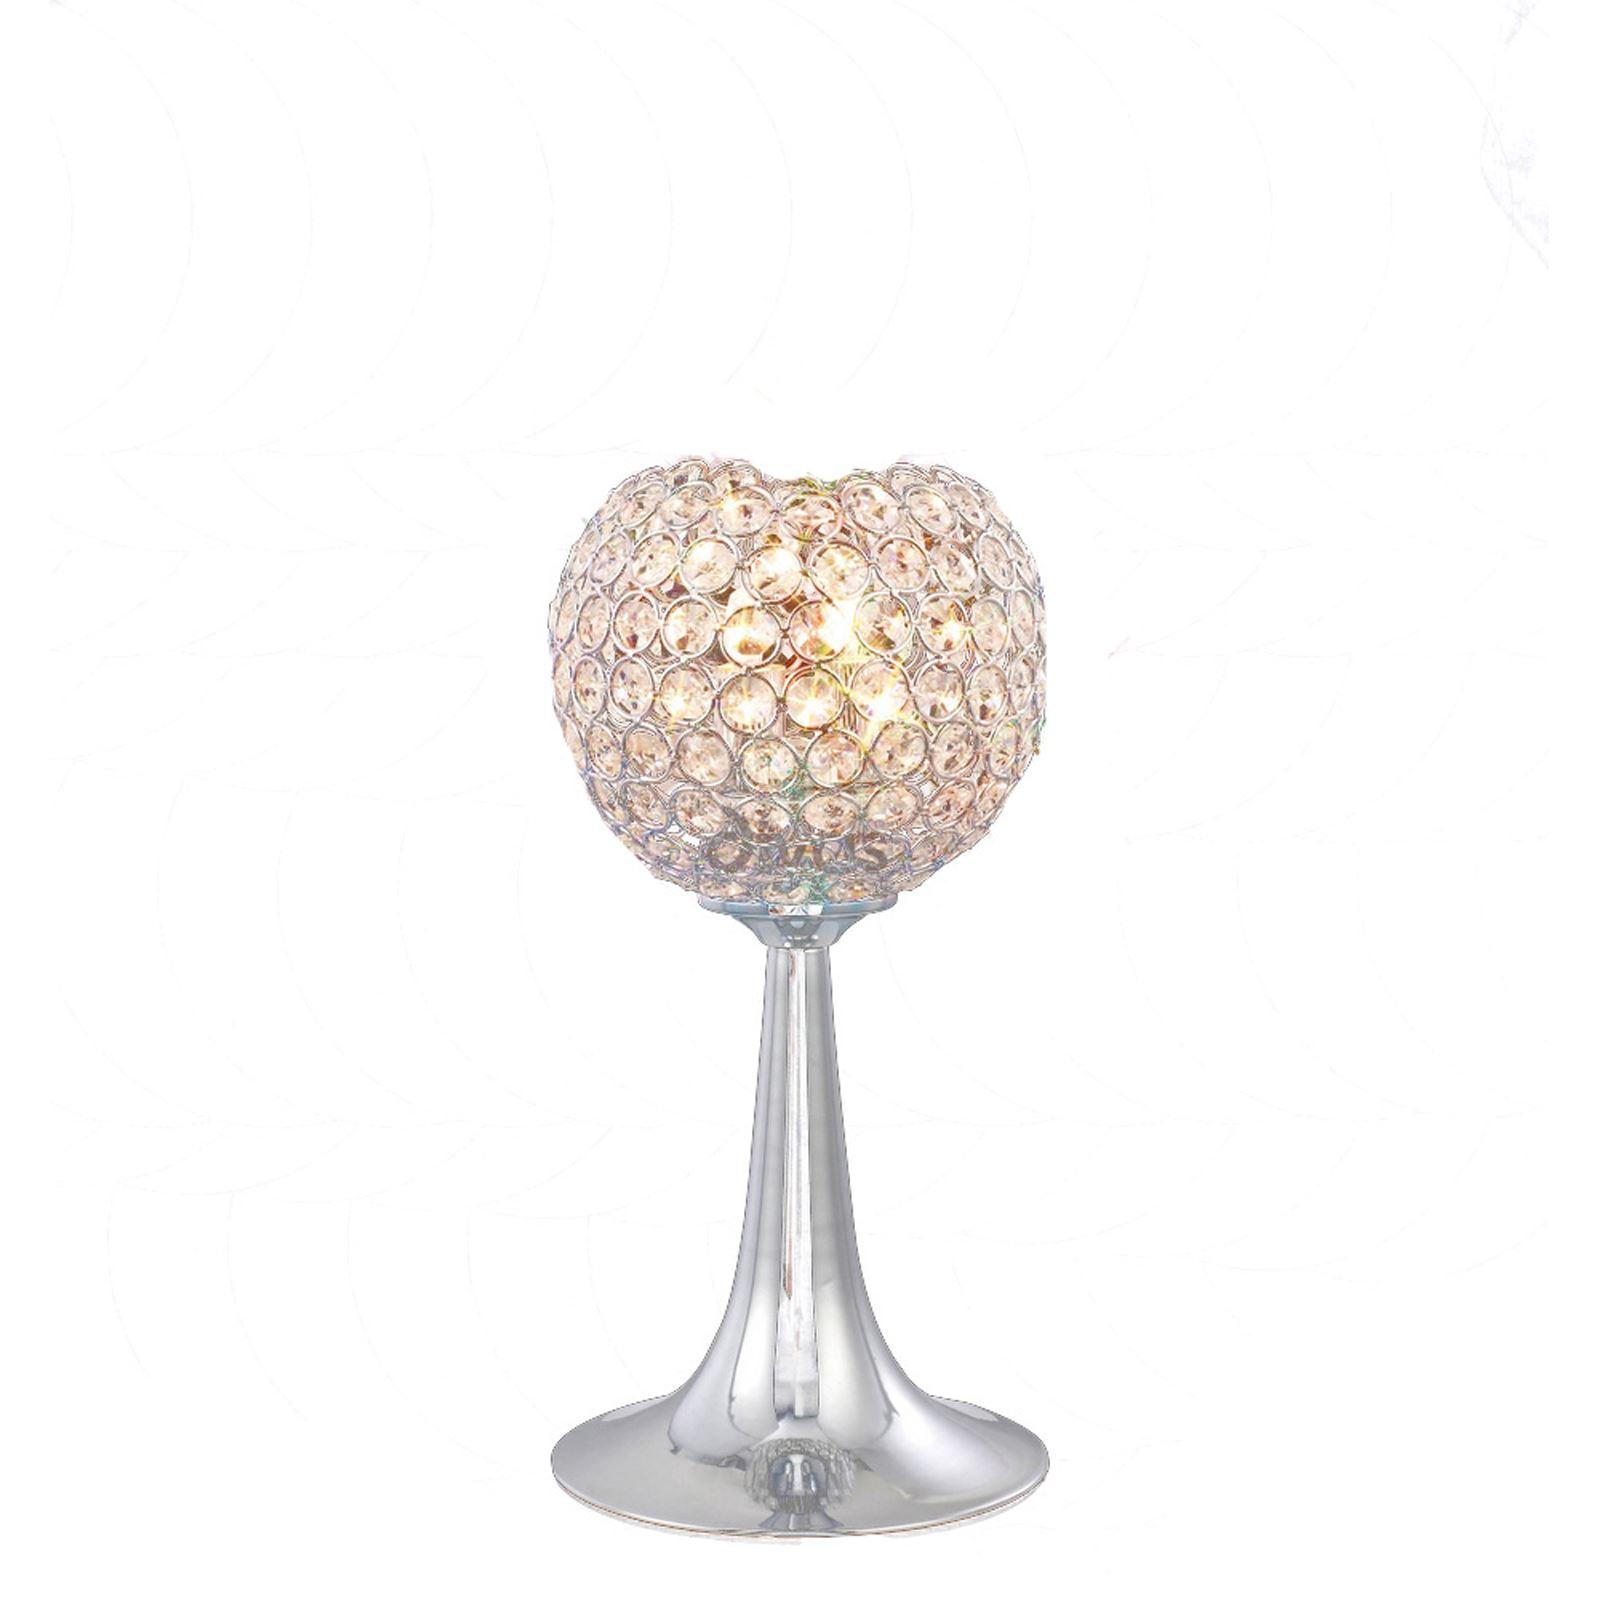 Modern And Stylish Table Lamp 2 Light Polished Chrome/Crystal